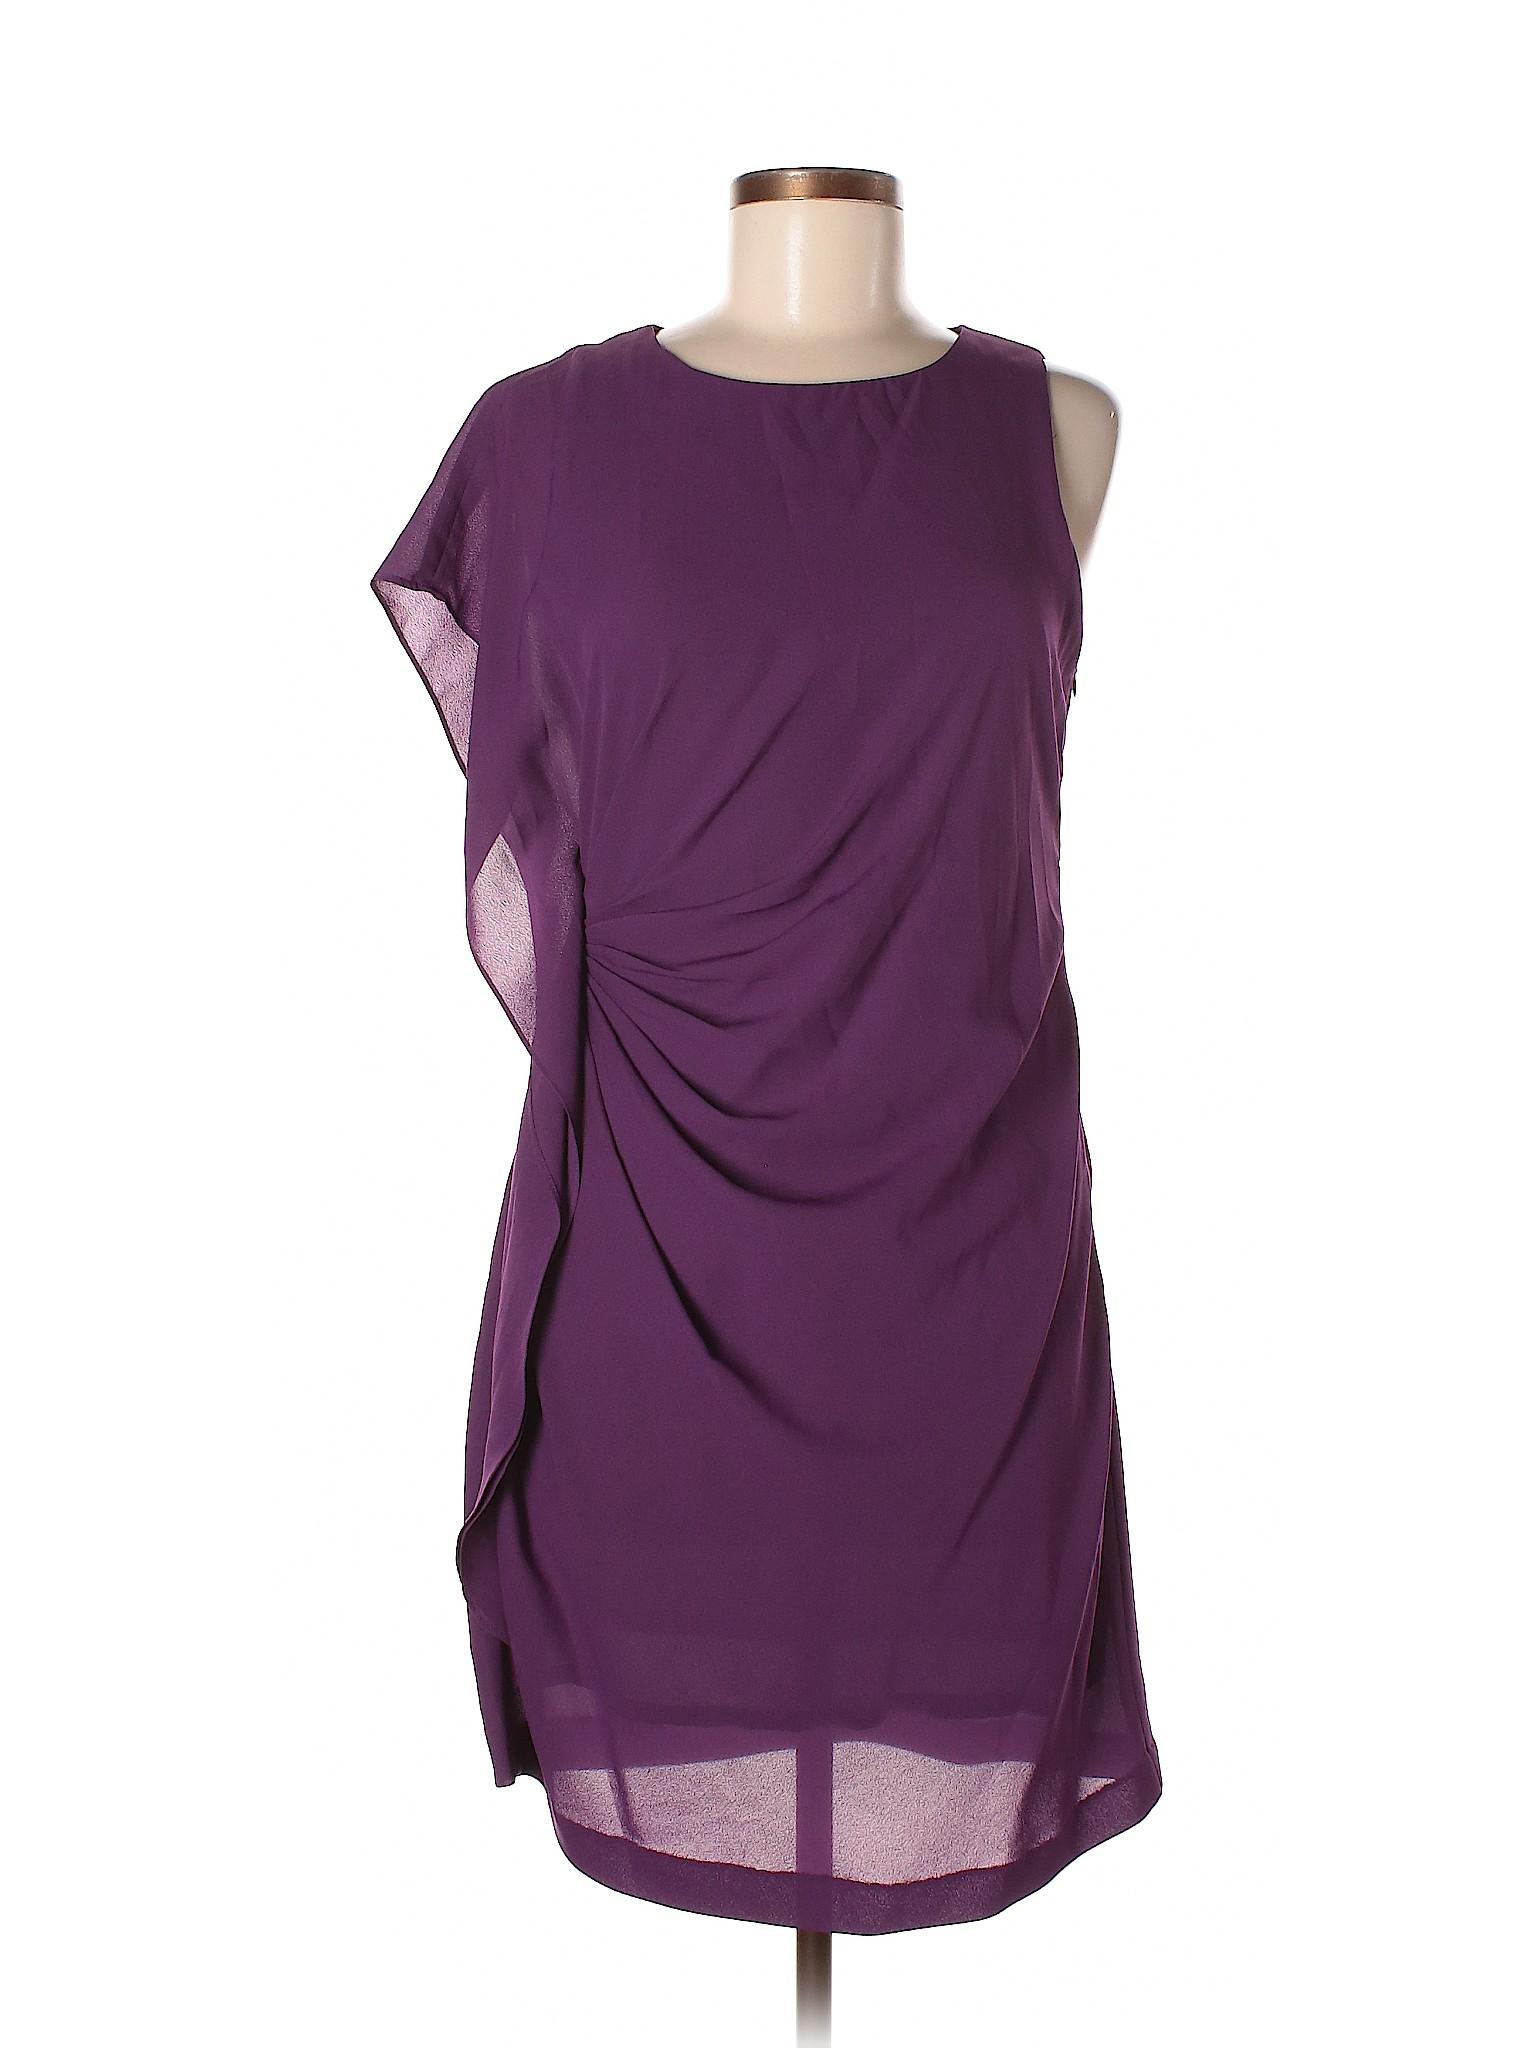 Dress Jaloux Dress Selling Casual Casual Selling Jaloux Jaloux Selling Selling Casual Casual Jaloux Dress Dress AEqxYY